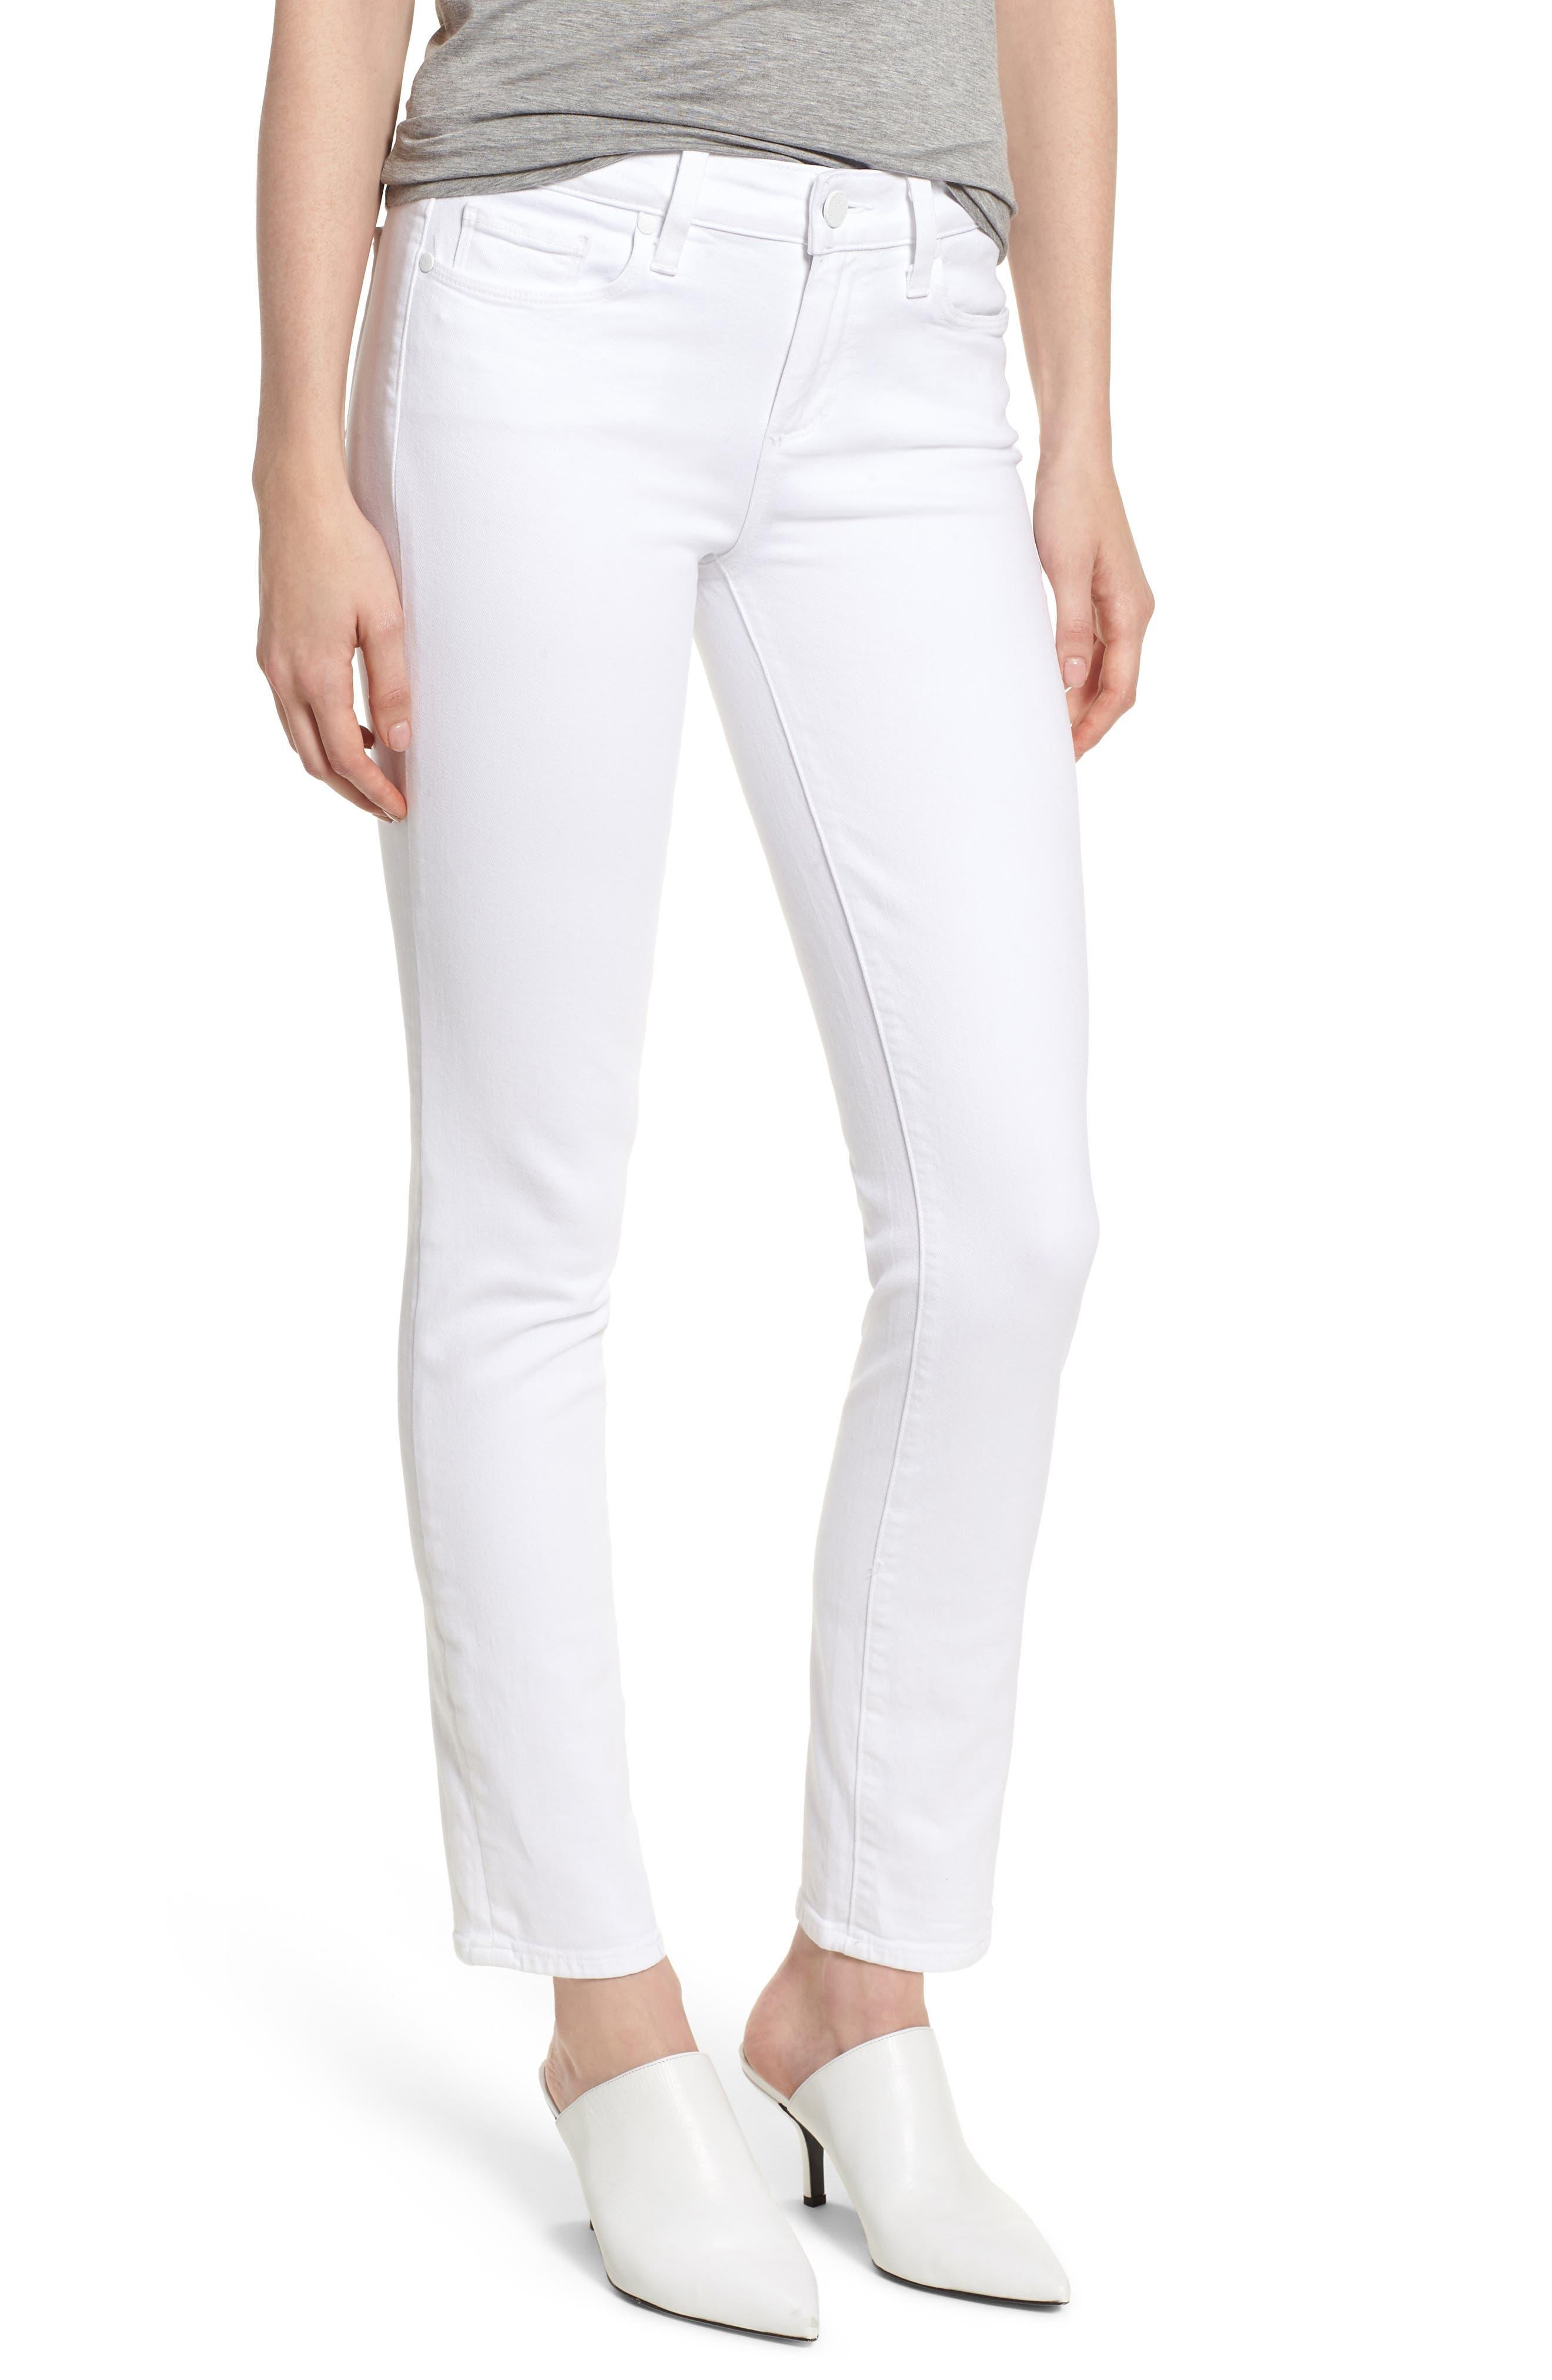 Main Image - PAIGE Skyline Ankle Peg Skinny Jeans (Crisp White)